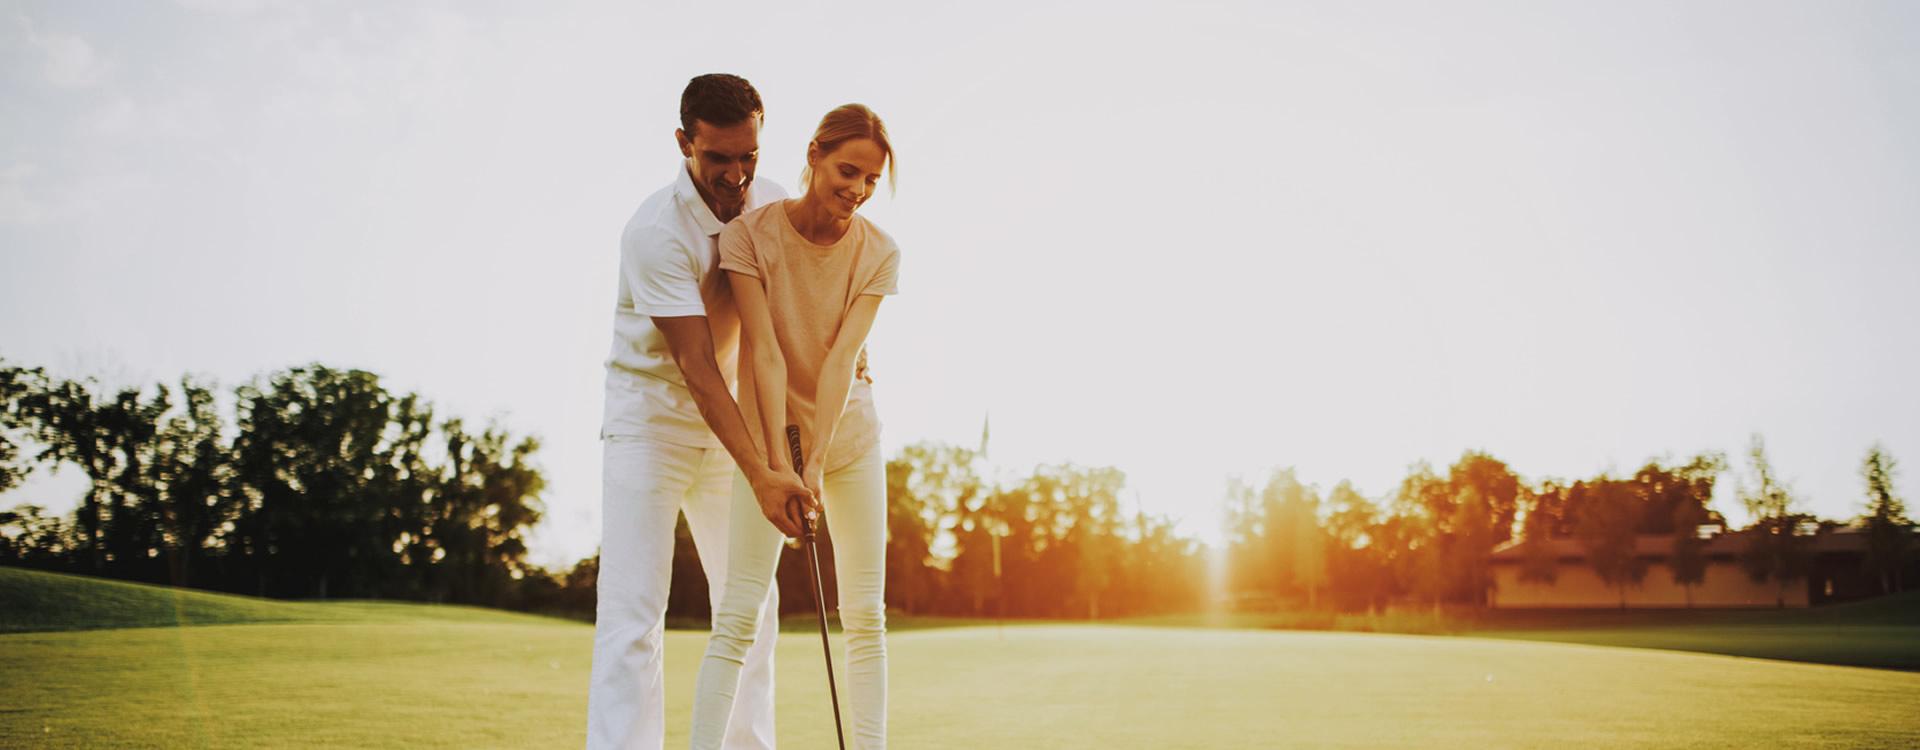 Golf partnervermittlung